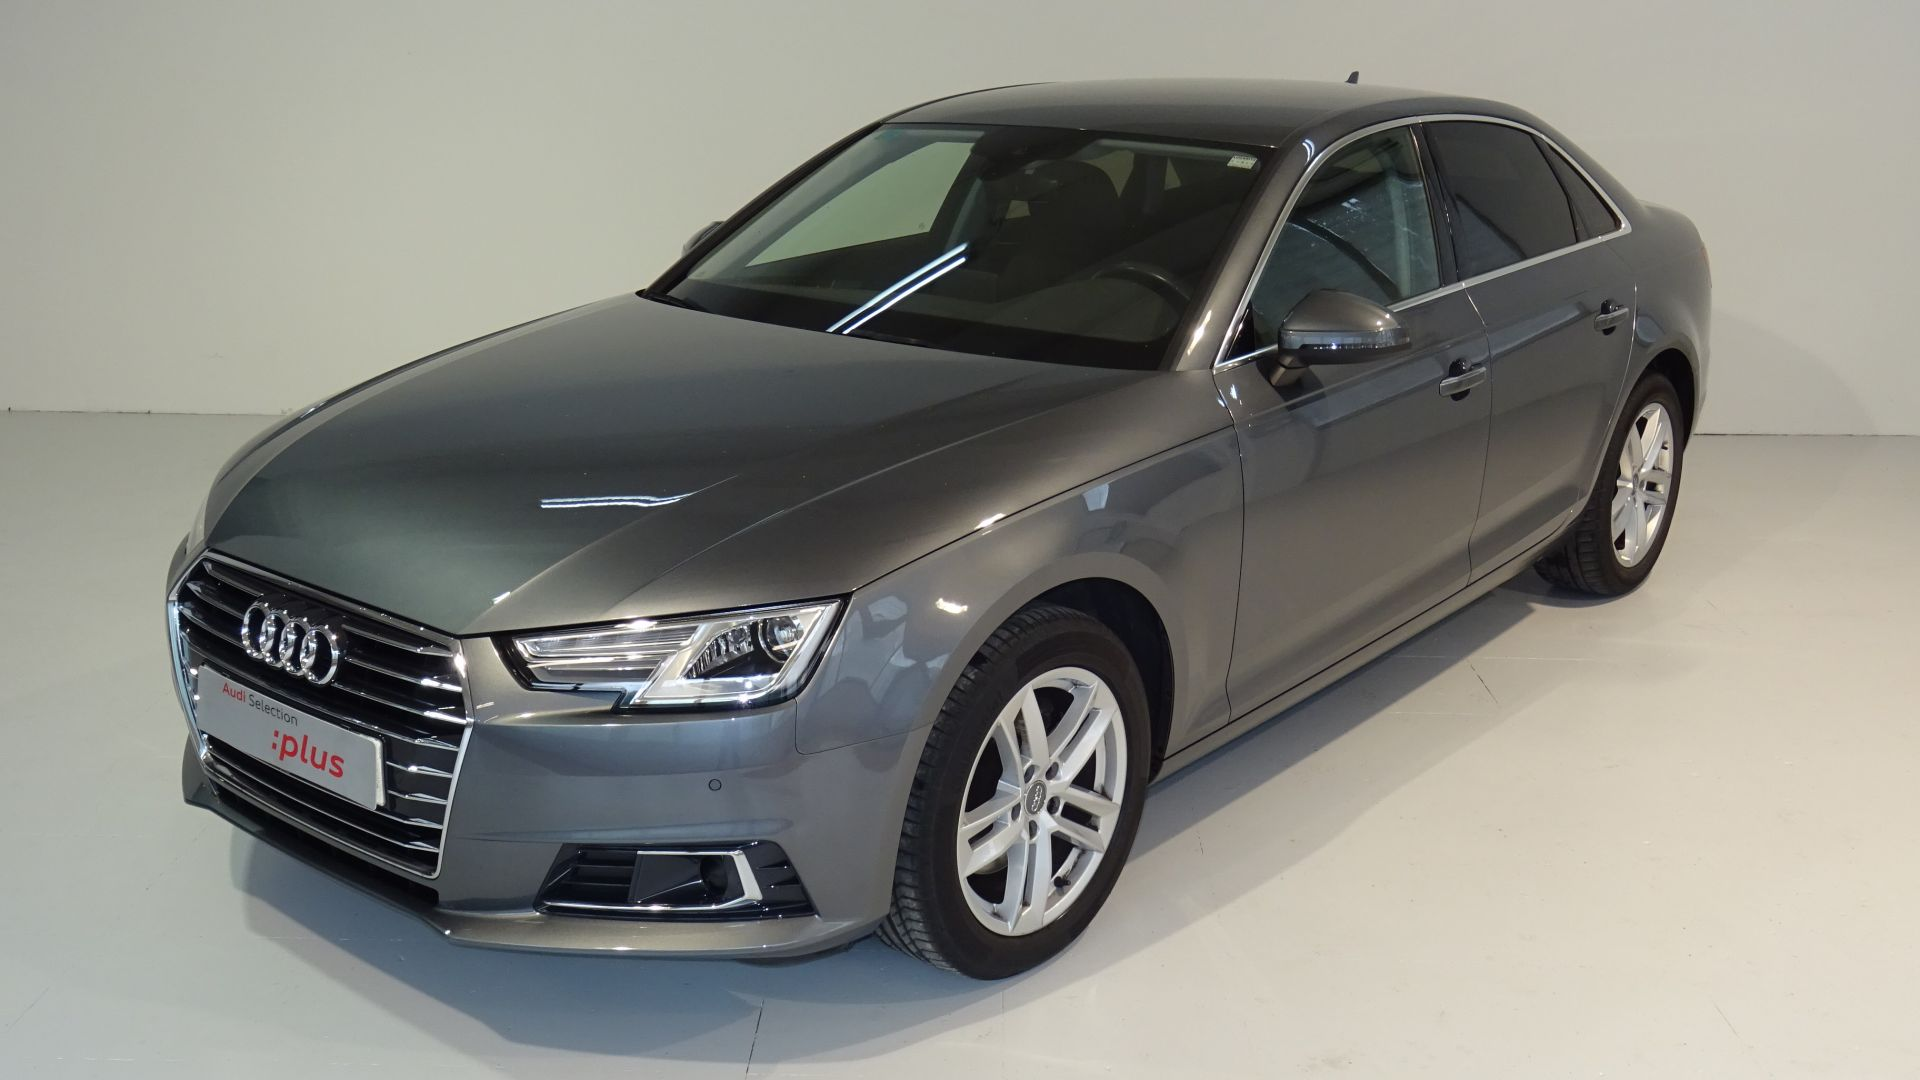 Audi A4 1.4 TFSI 150CV design edition